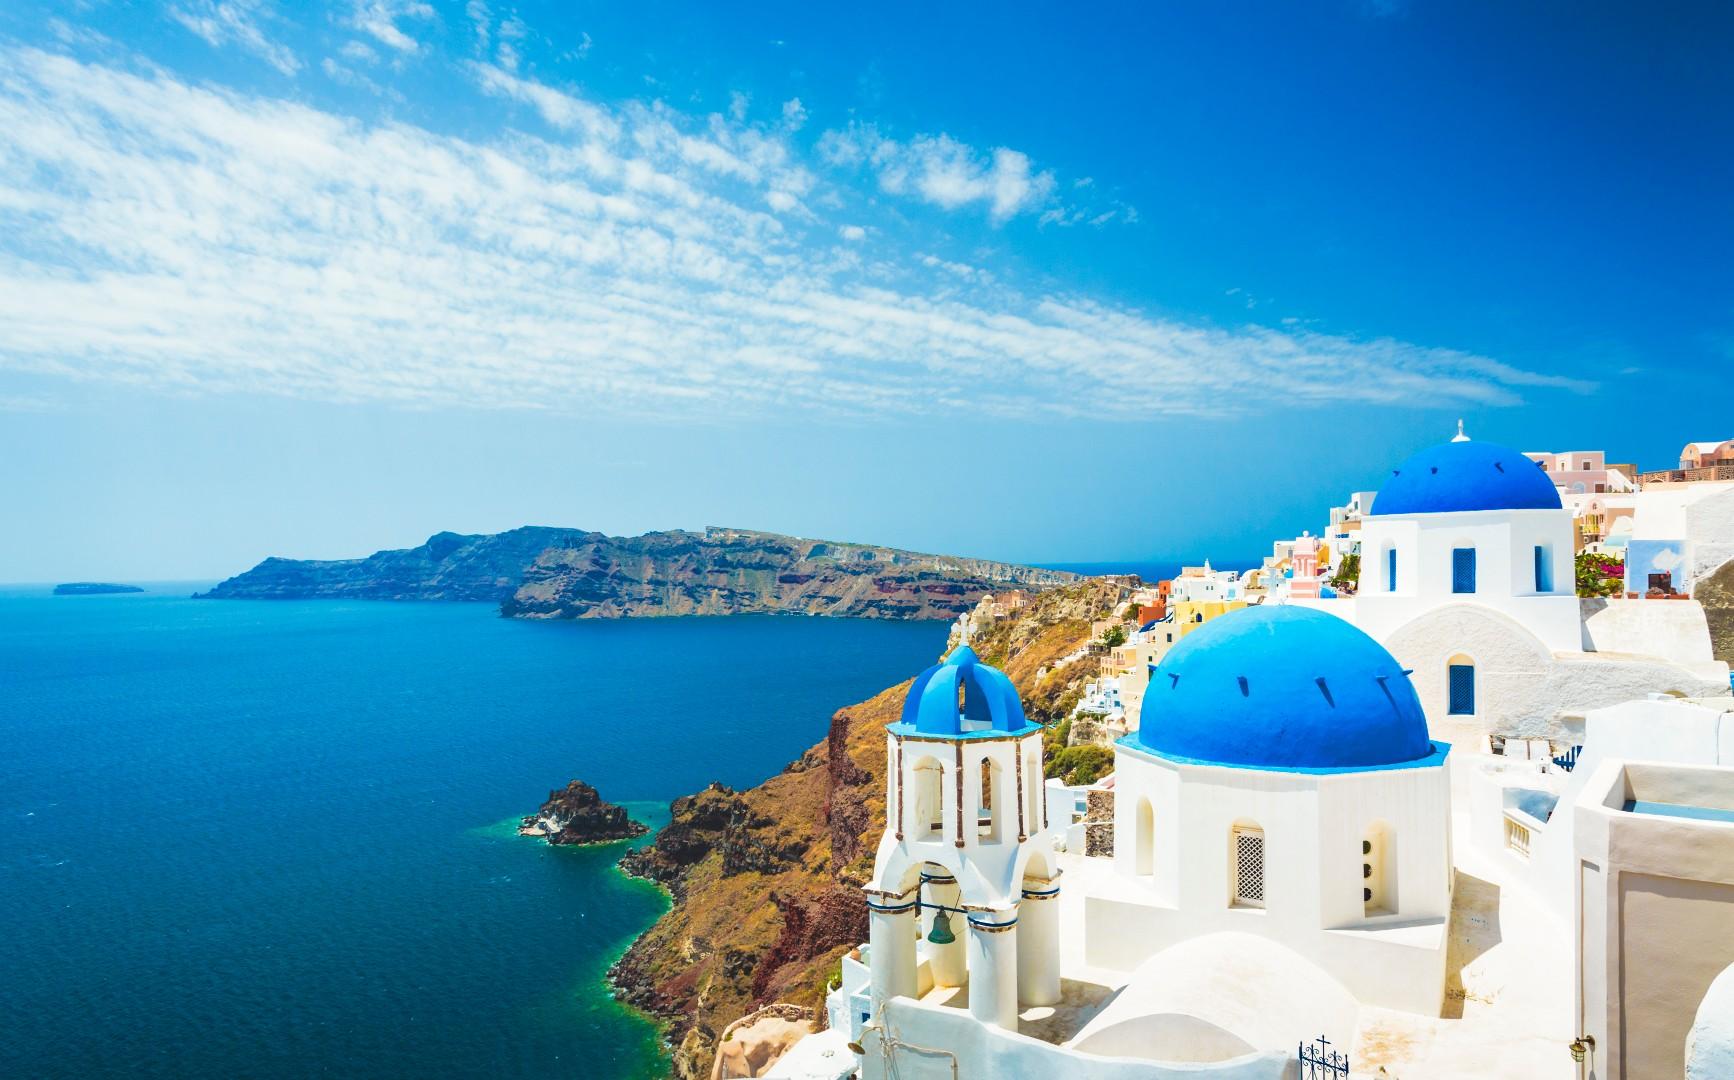 griechenland kennenlernen fragen zum kennenlernen meeting